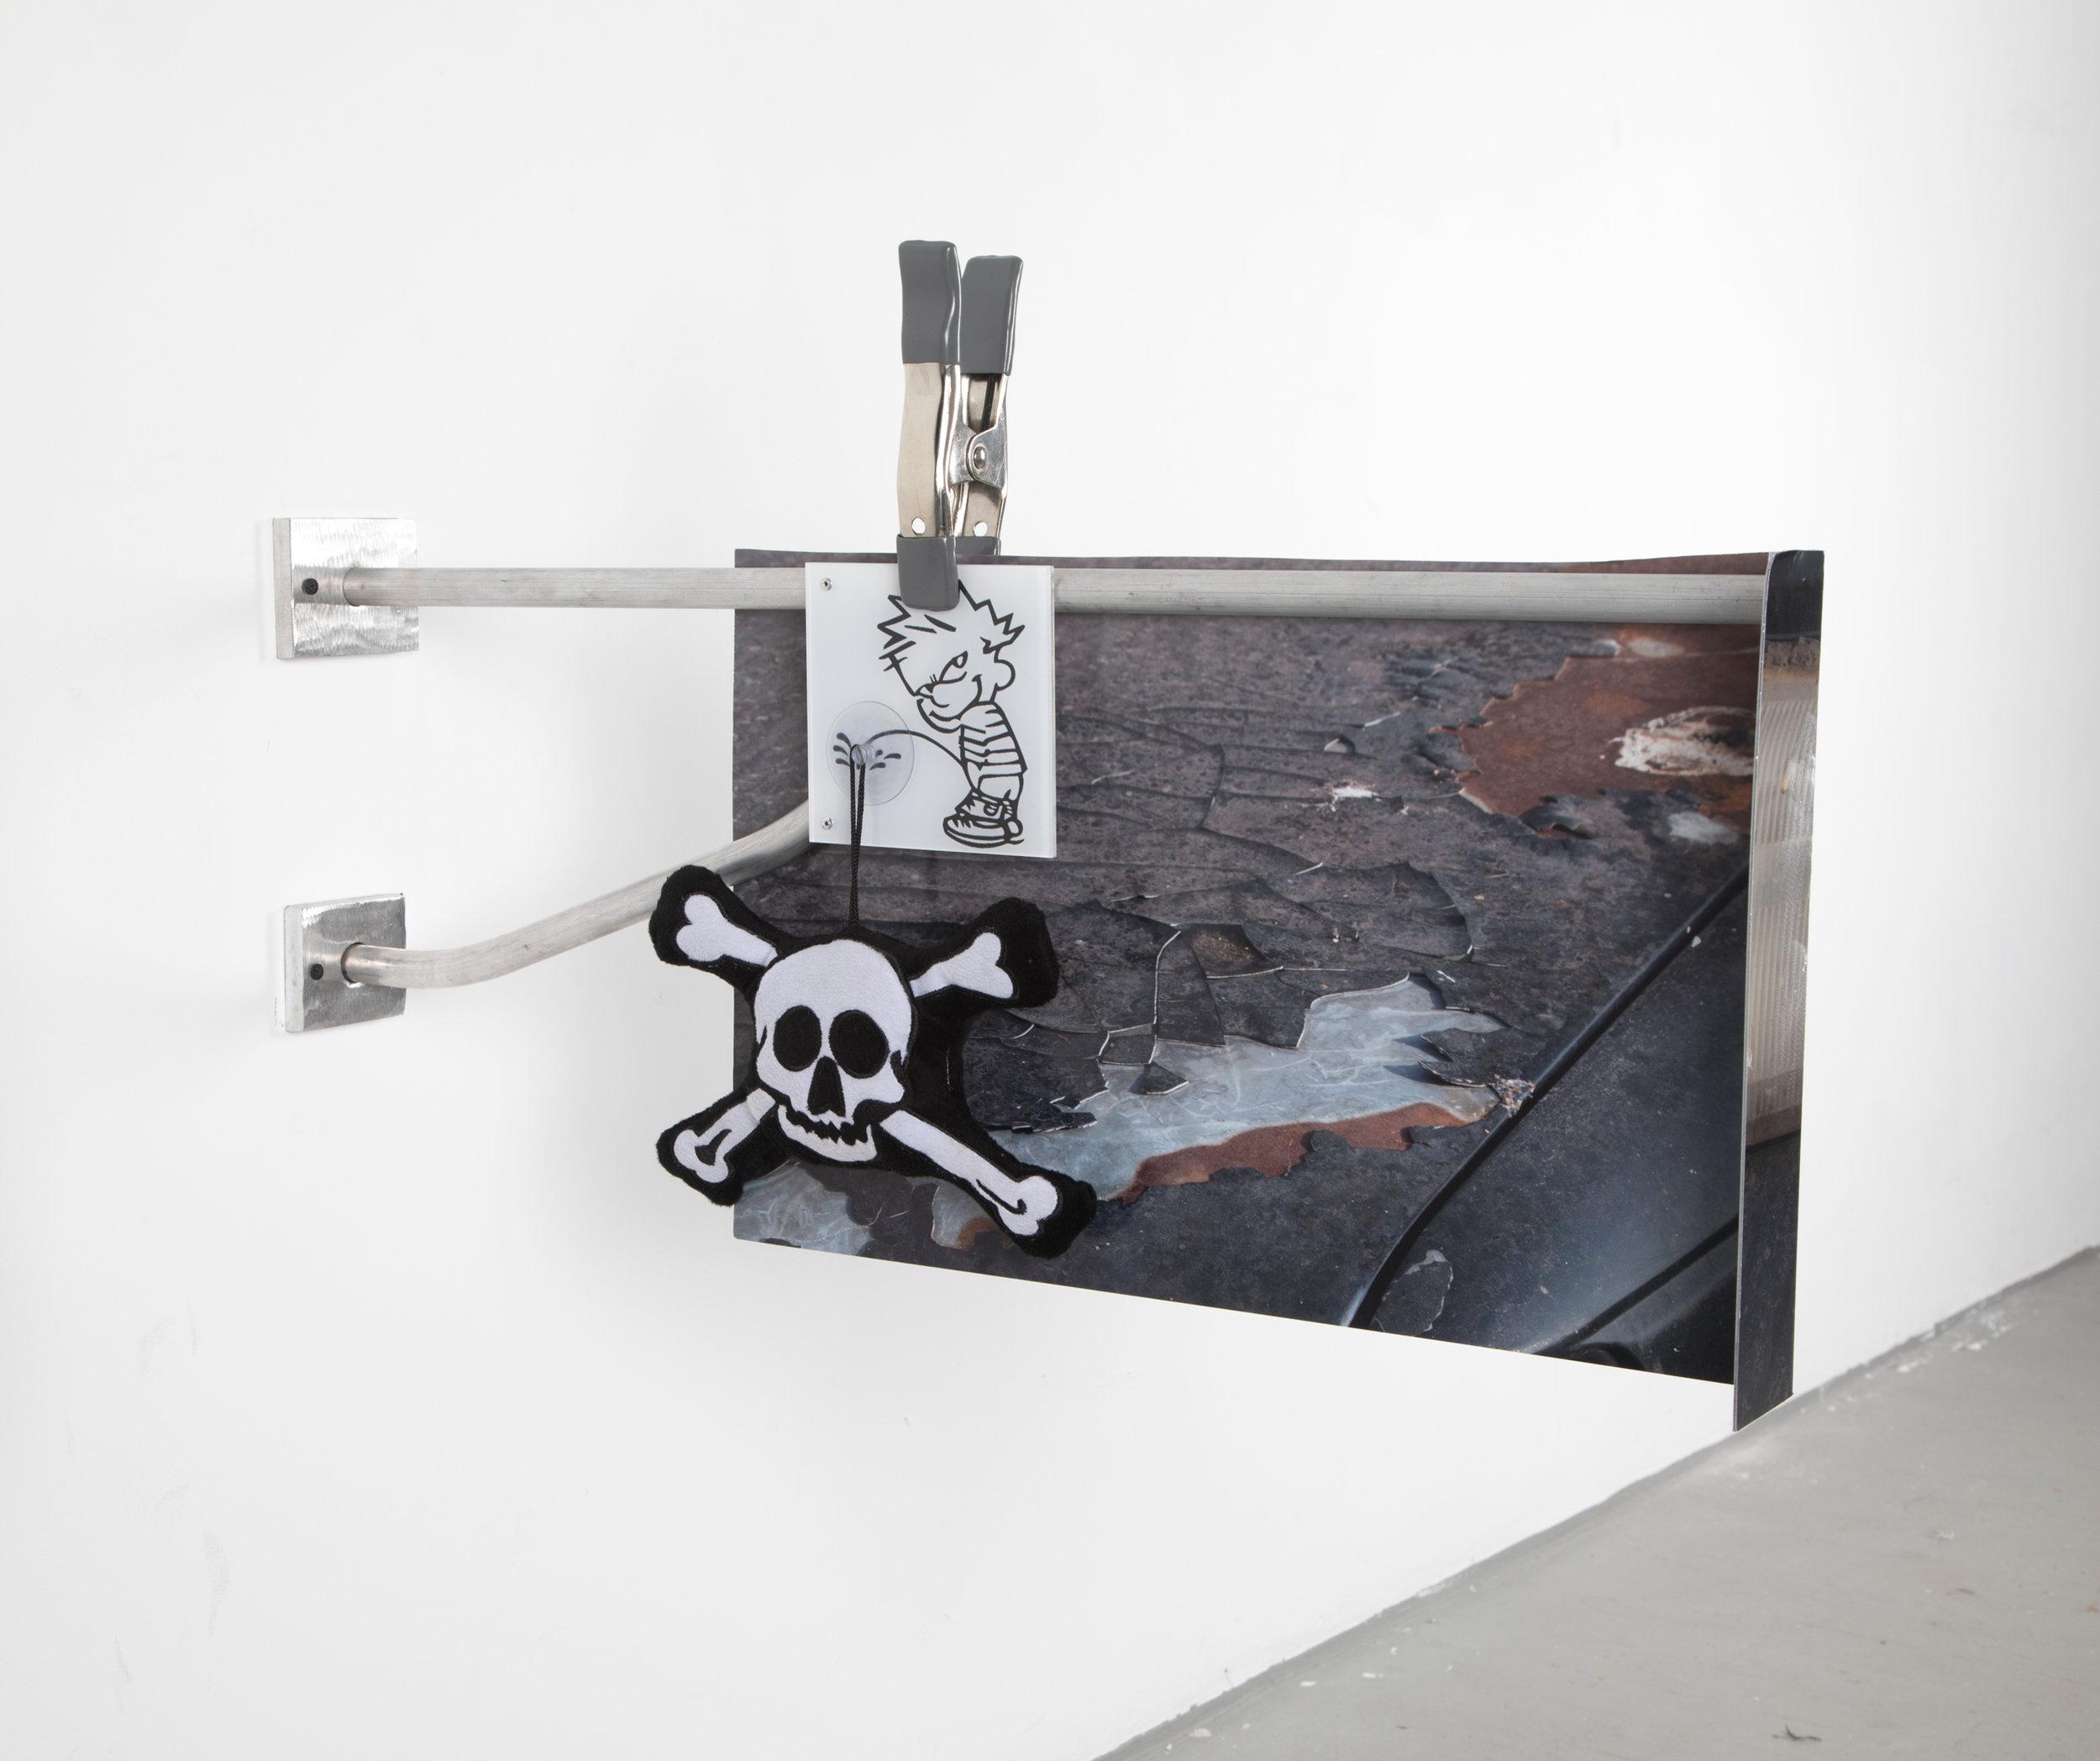 Calvin Cracked, 2018  aluminum,UV print on plexi, plushy, vinyl, clamp, rivets, hardware